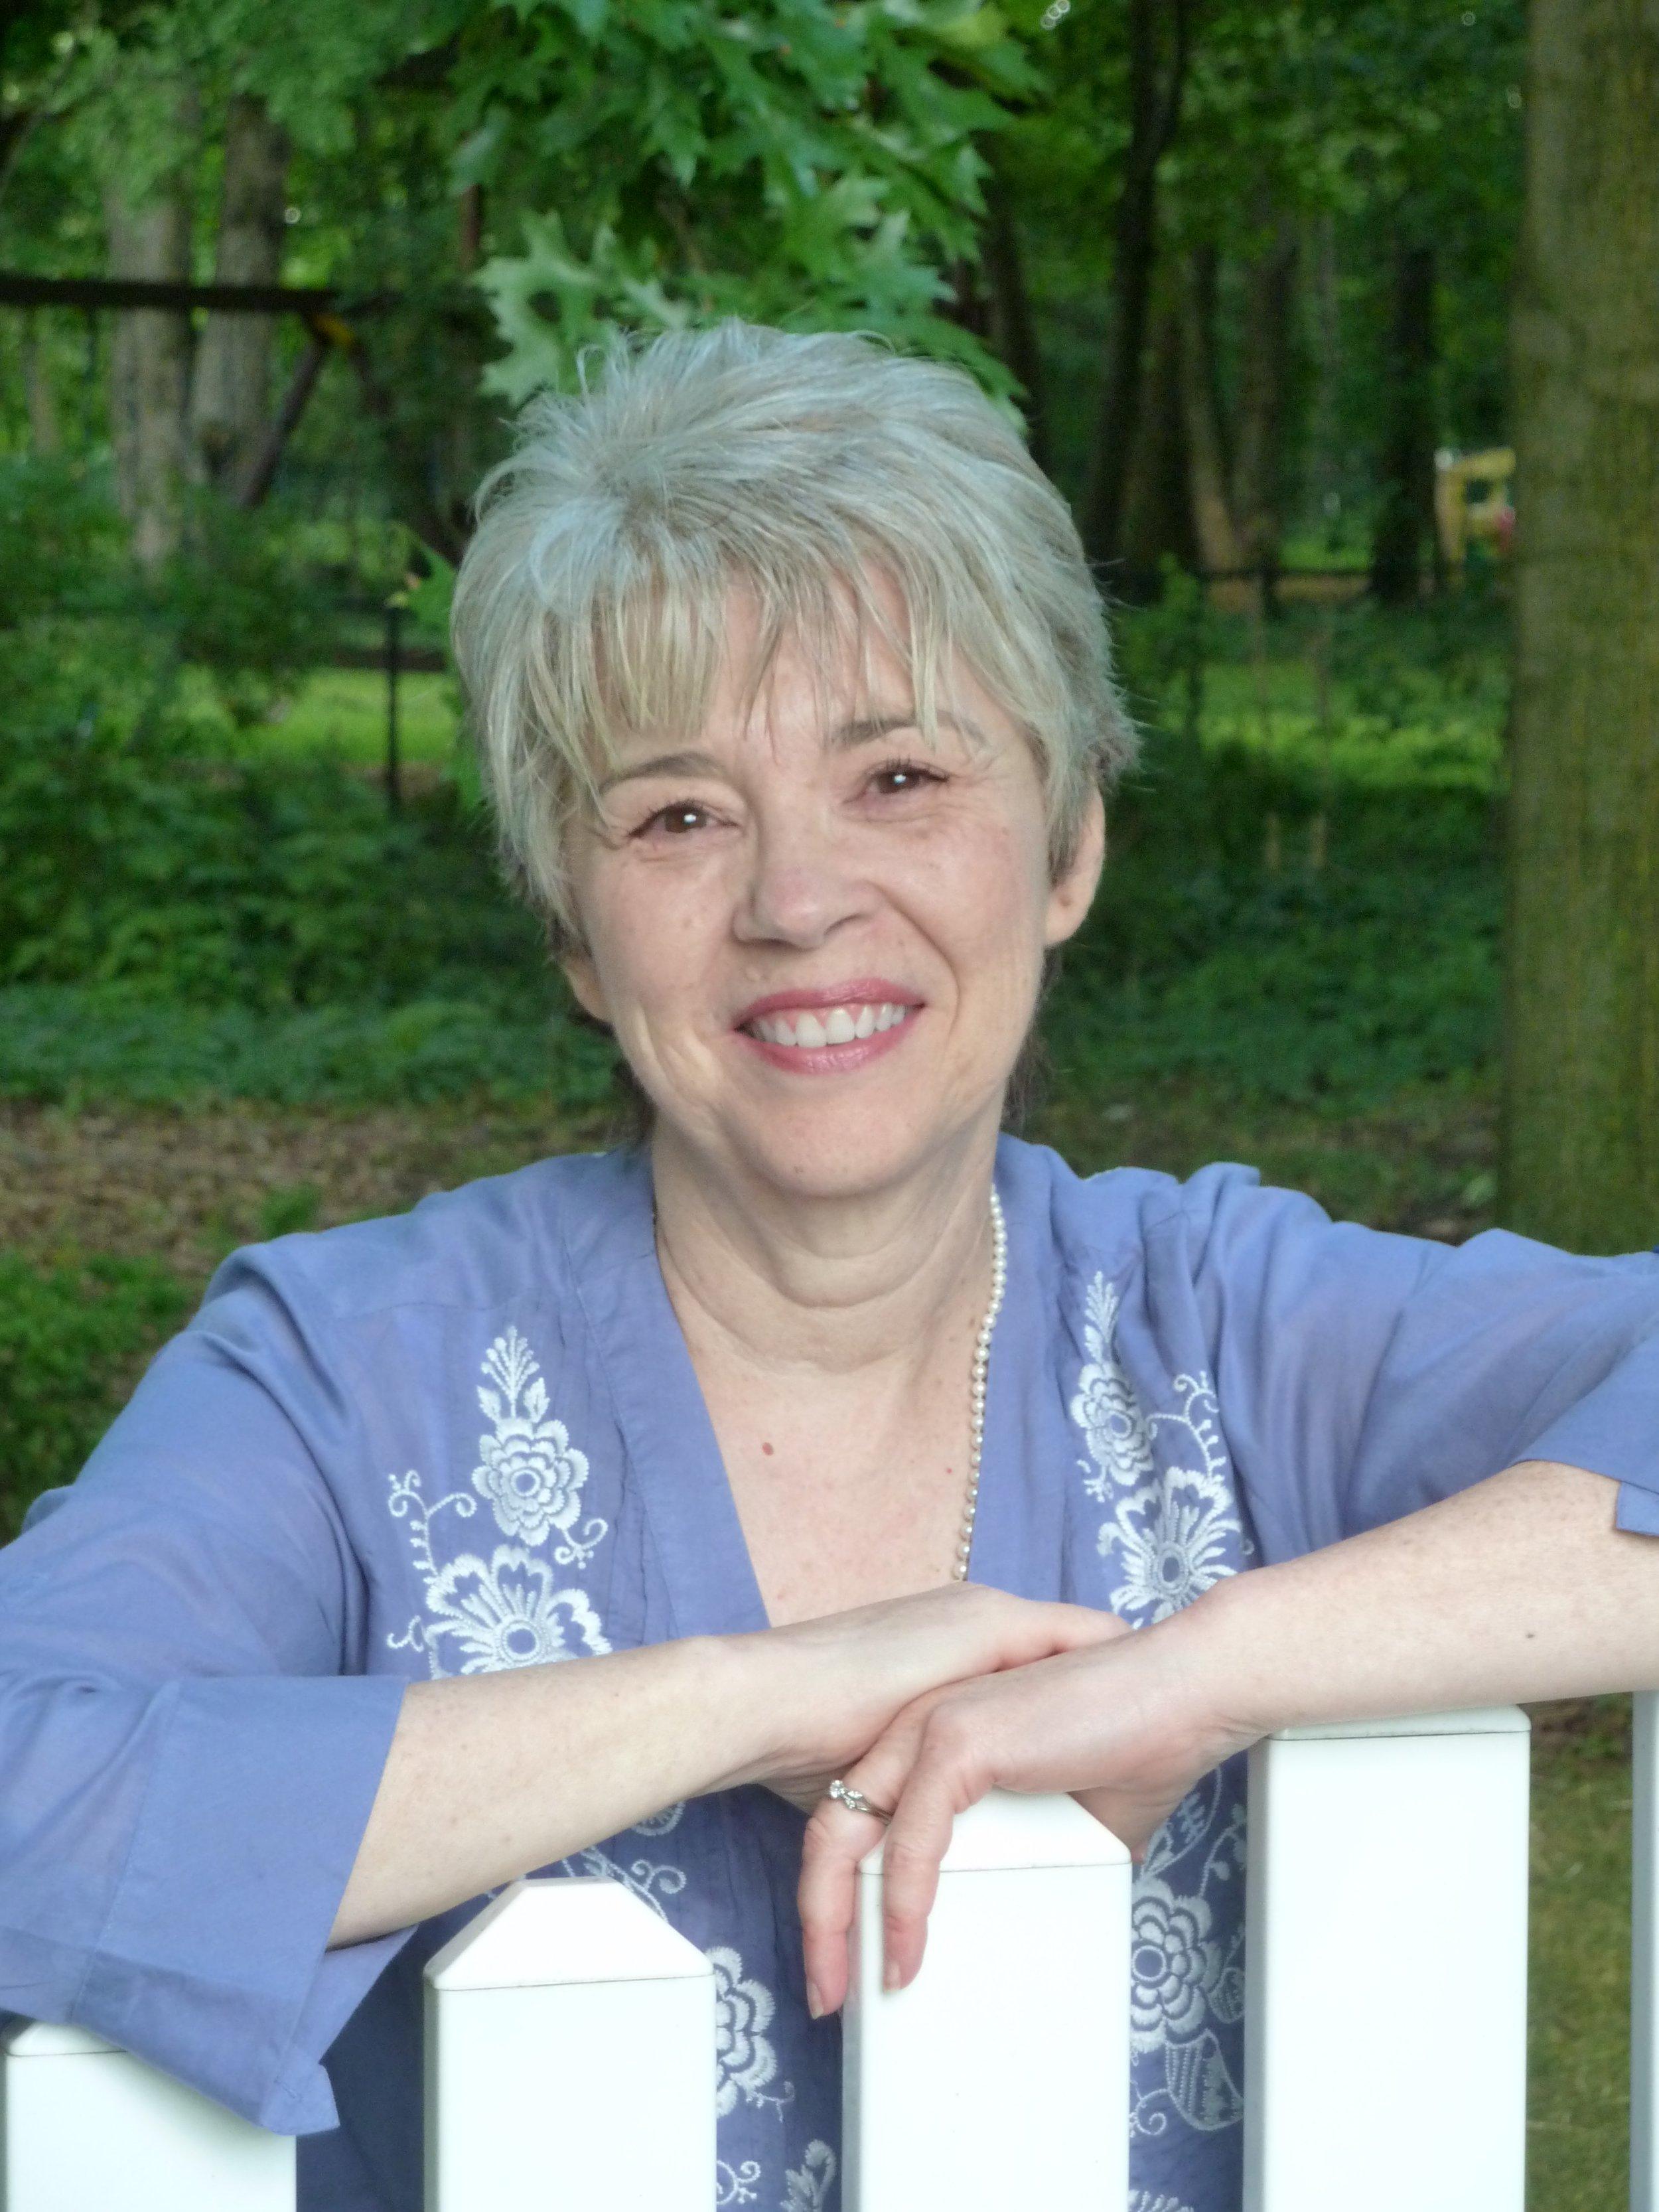 Mary Doria Russell